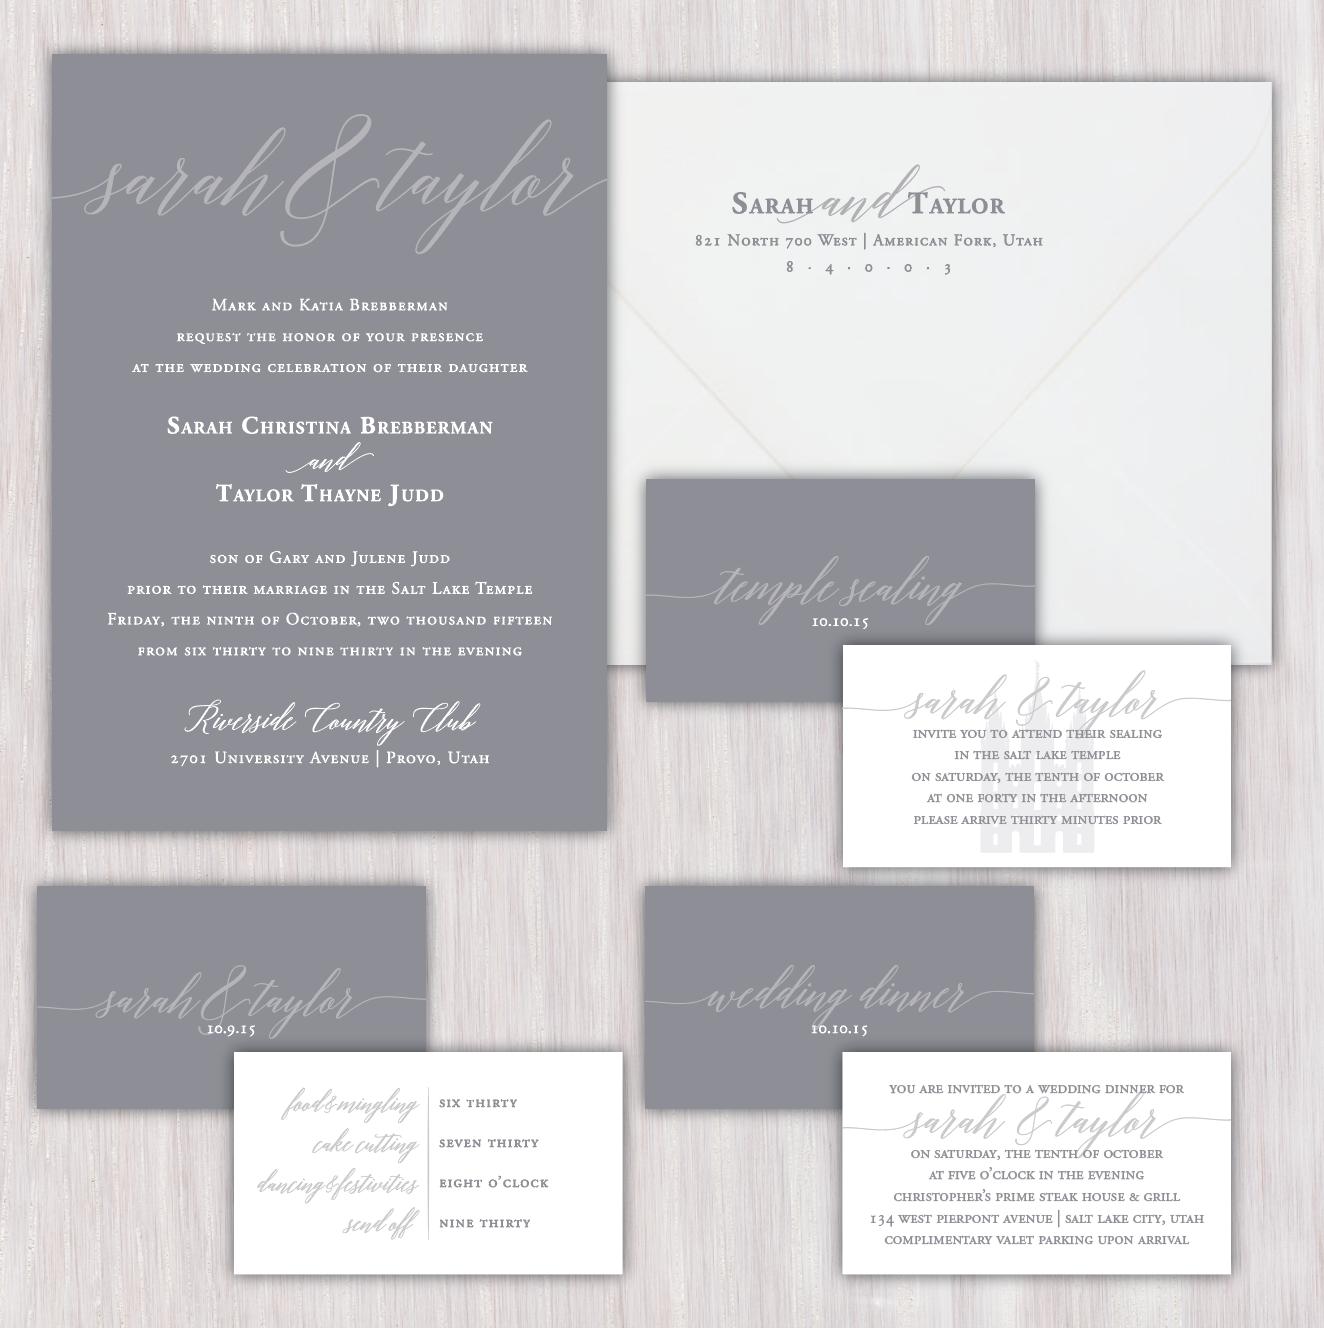 Classy simple elegant solid gray background single sided custom designed wedding invitations and decor monicamarmolfo Images